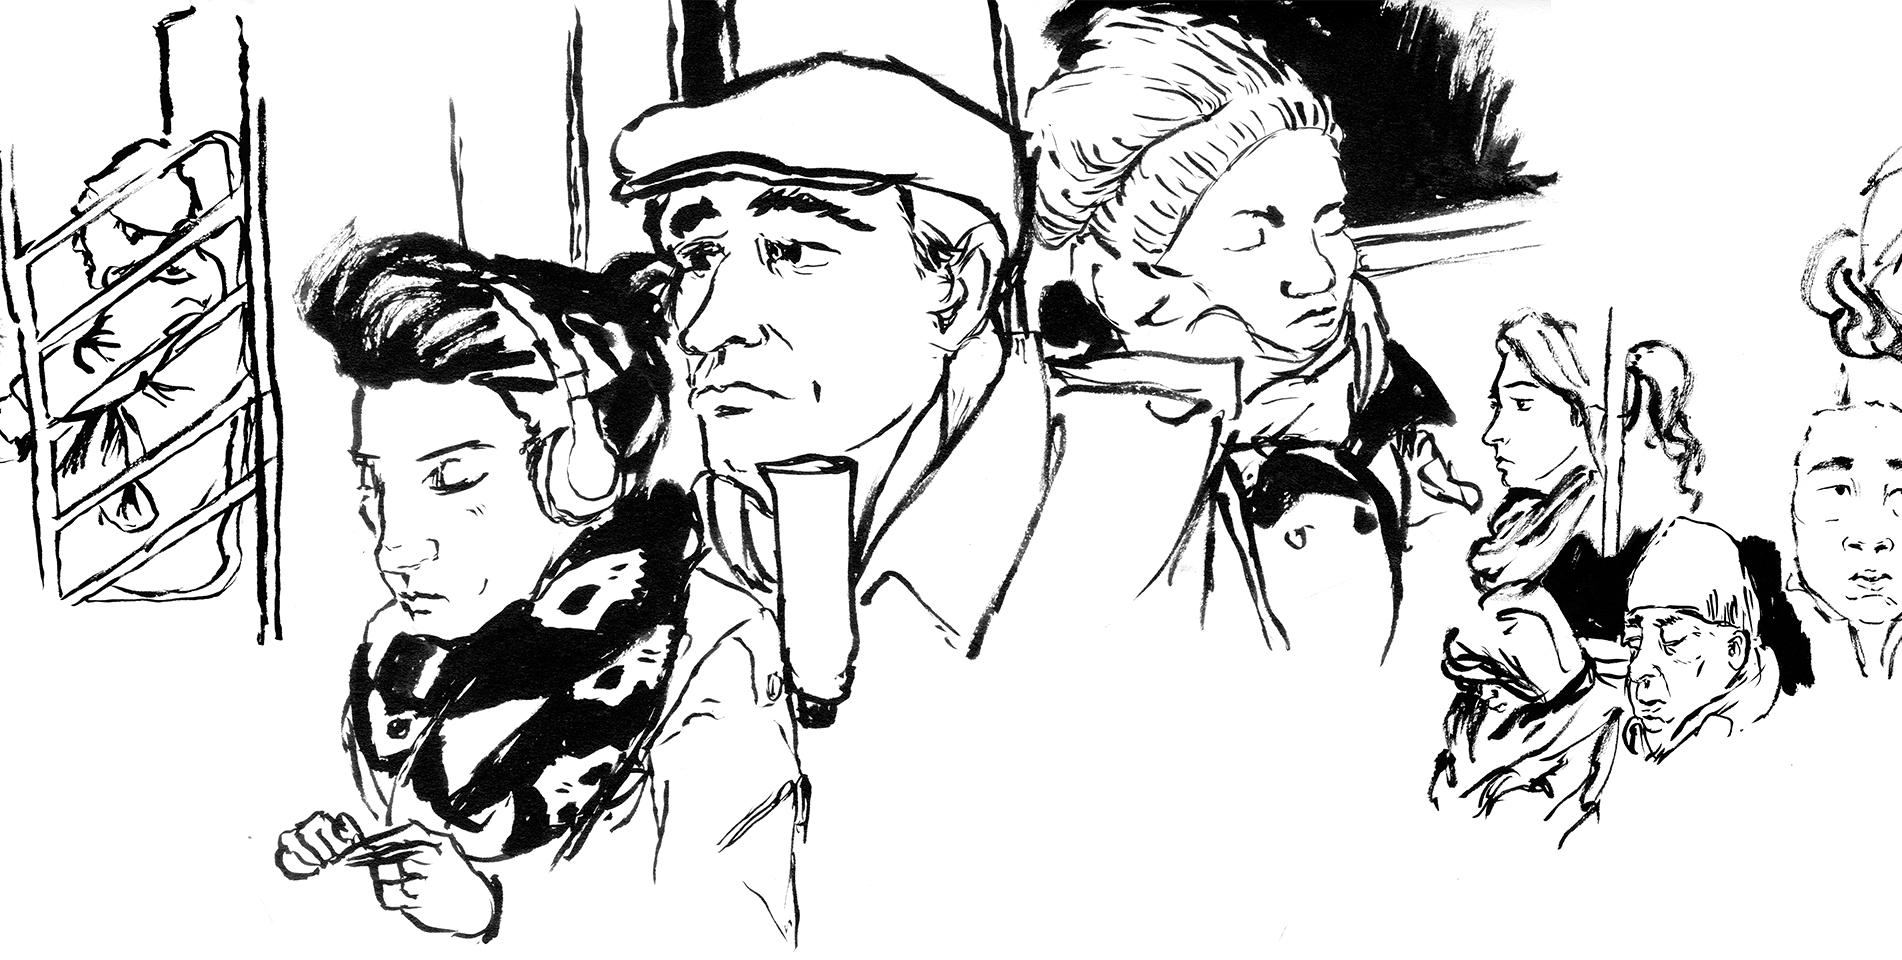 Subway Project - drawn on location